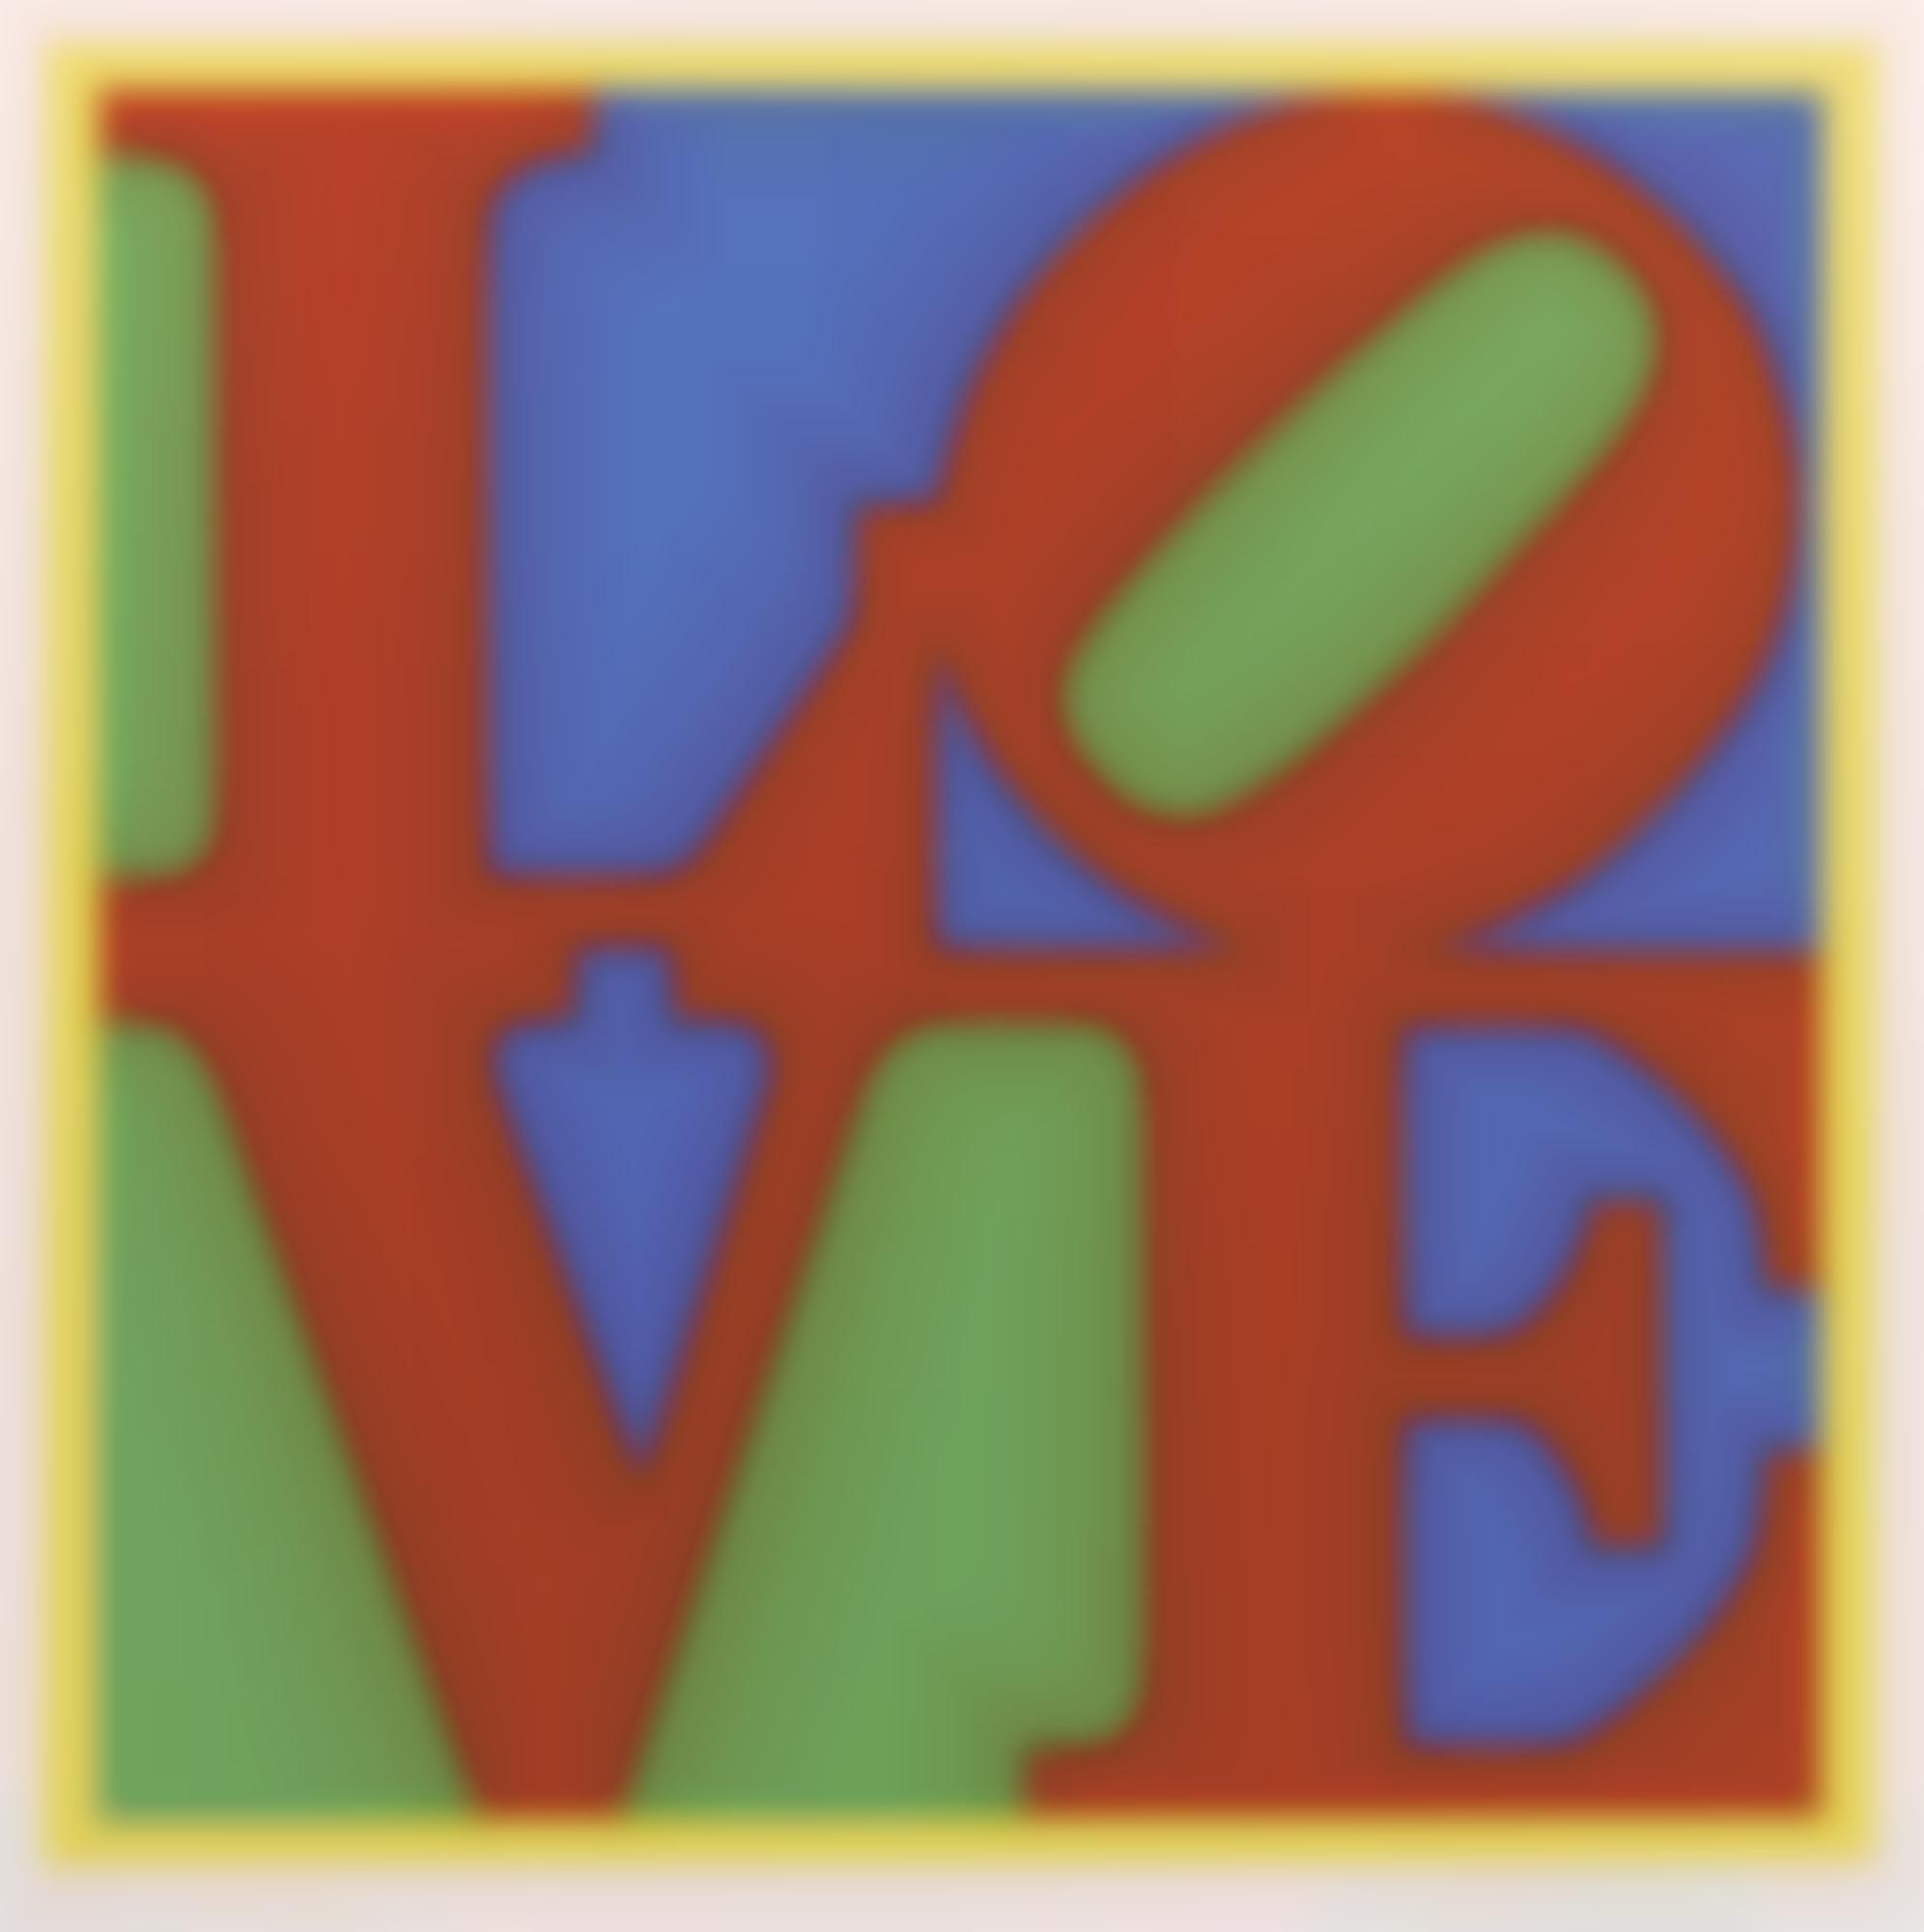 Robert Indiana-Heliotherapy Love-1995